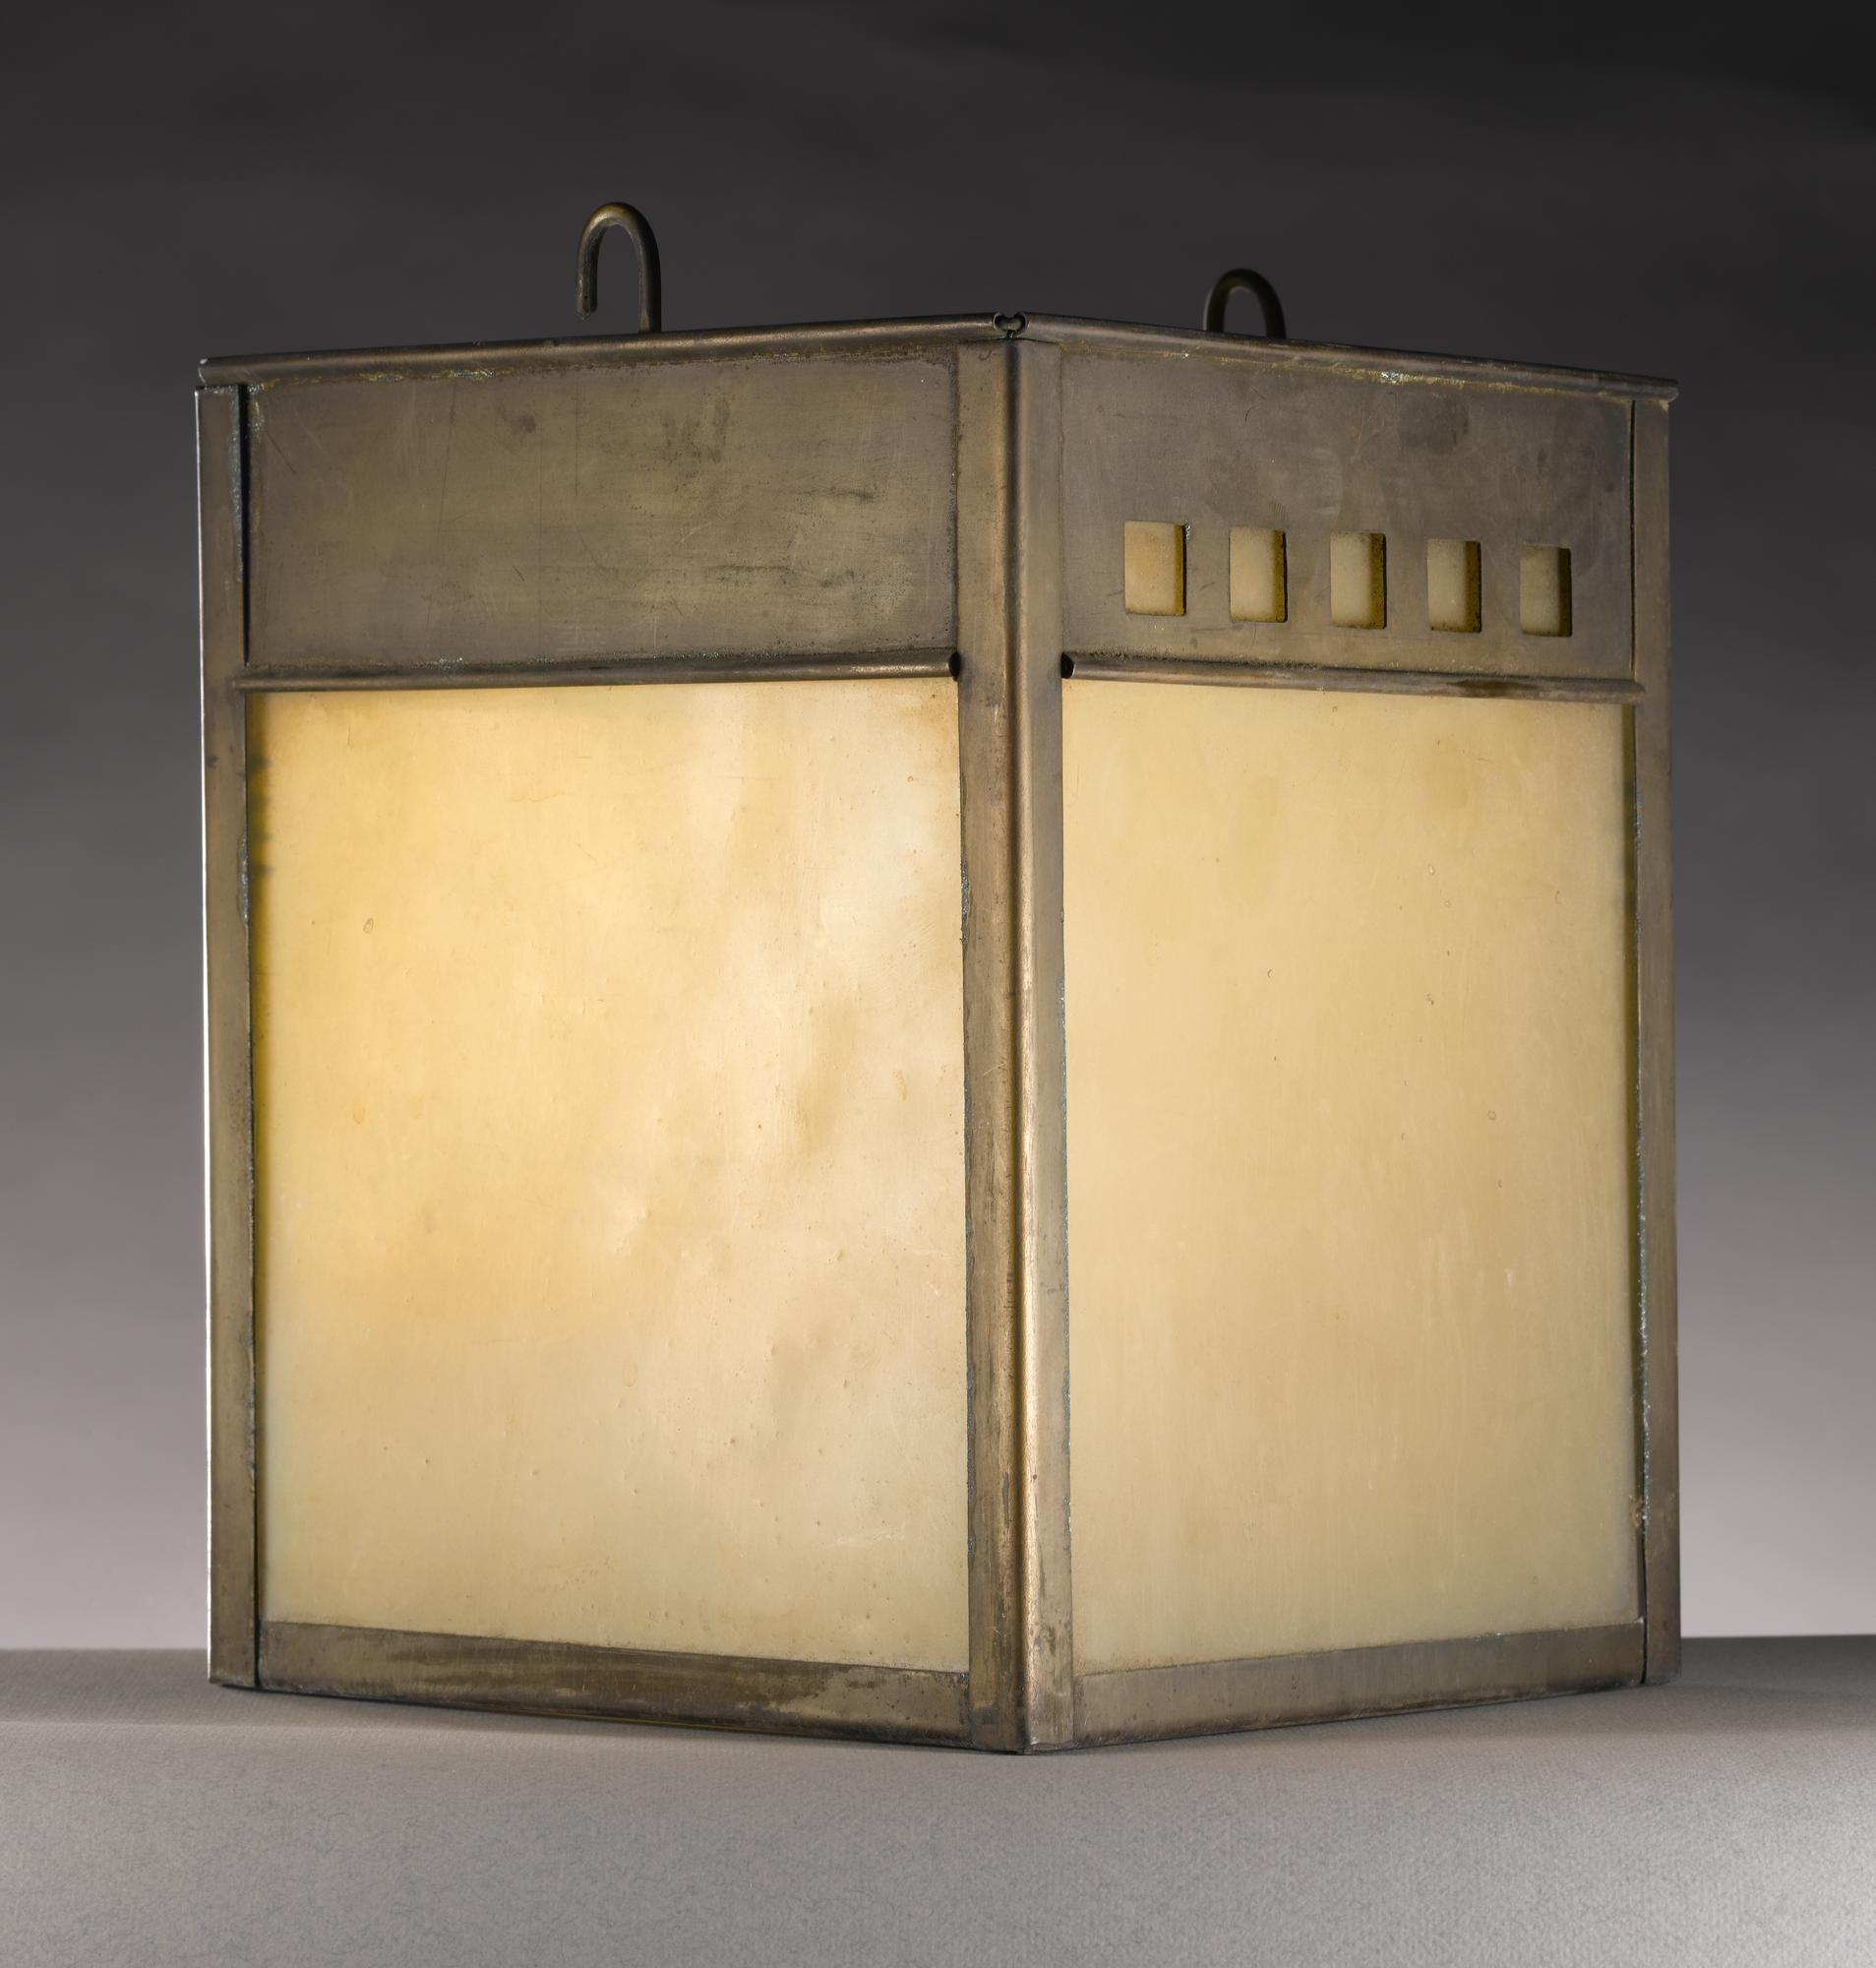 Kitchen Lighting Glasgow: Pendant Copper Light Shade With Glass Panels: British